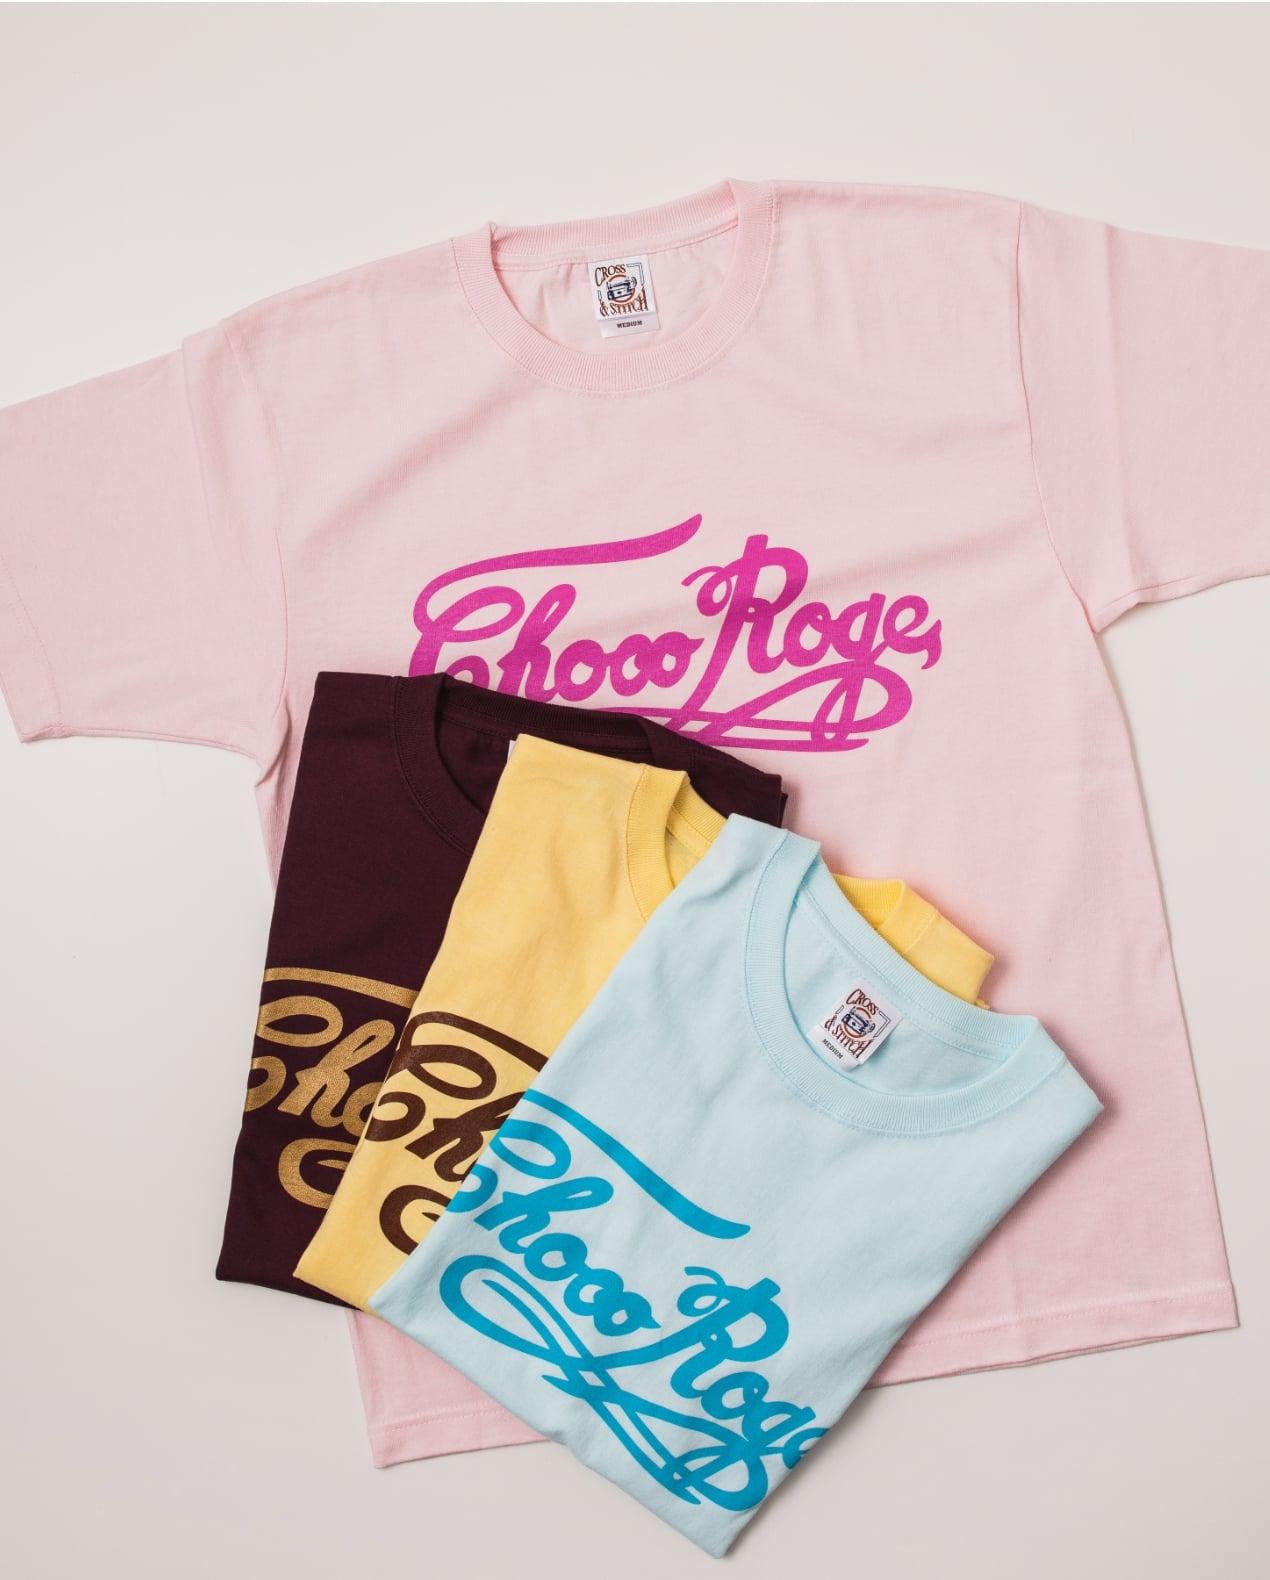 Tシャツ 大人用 ピンク サイズM